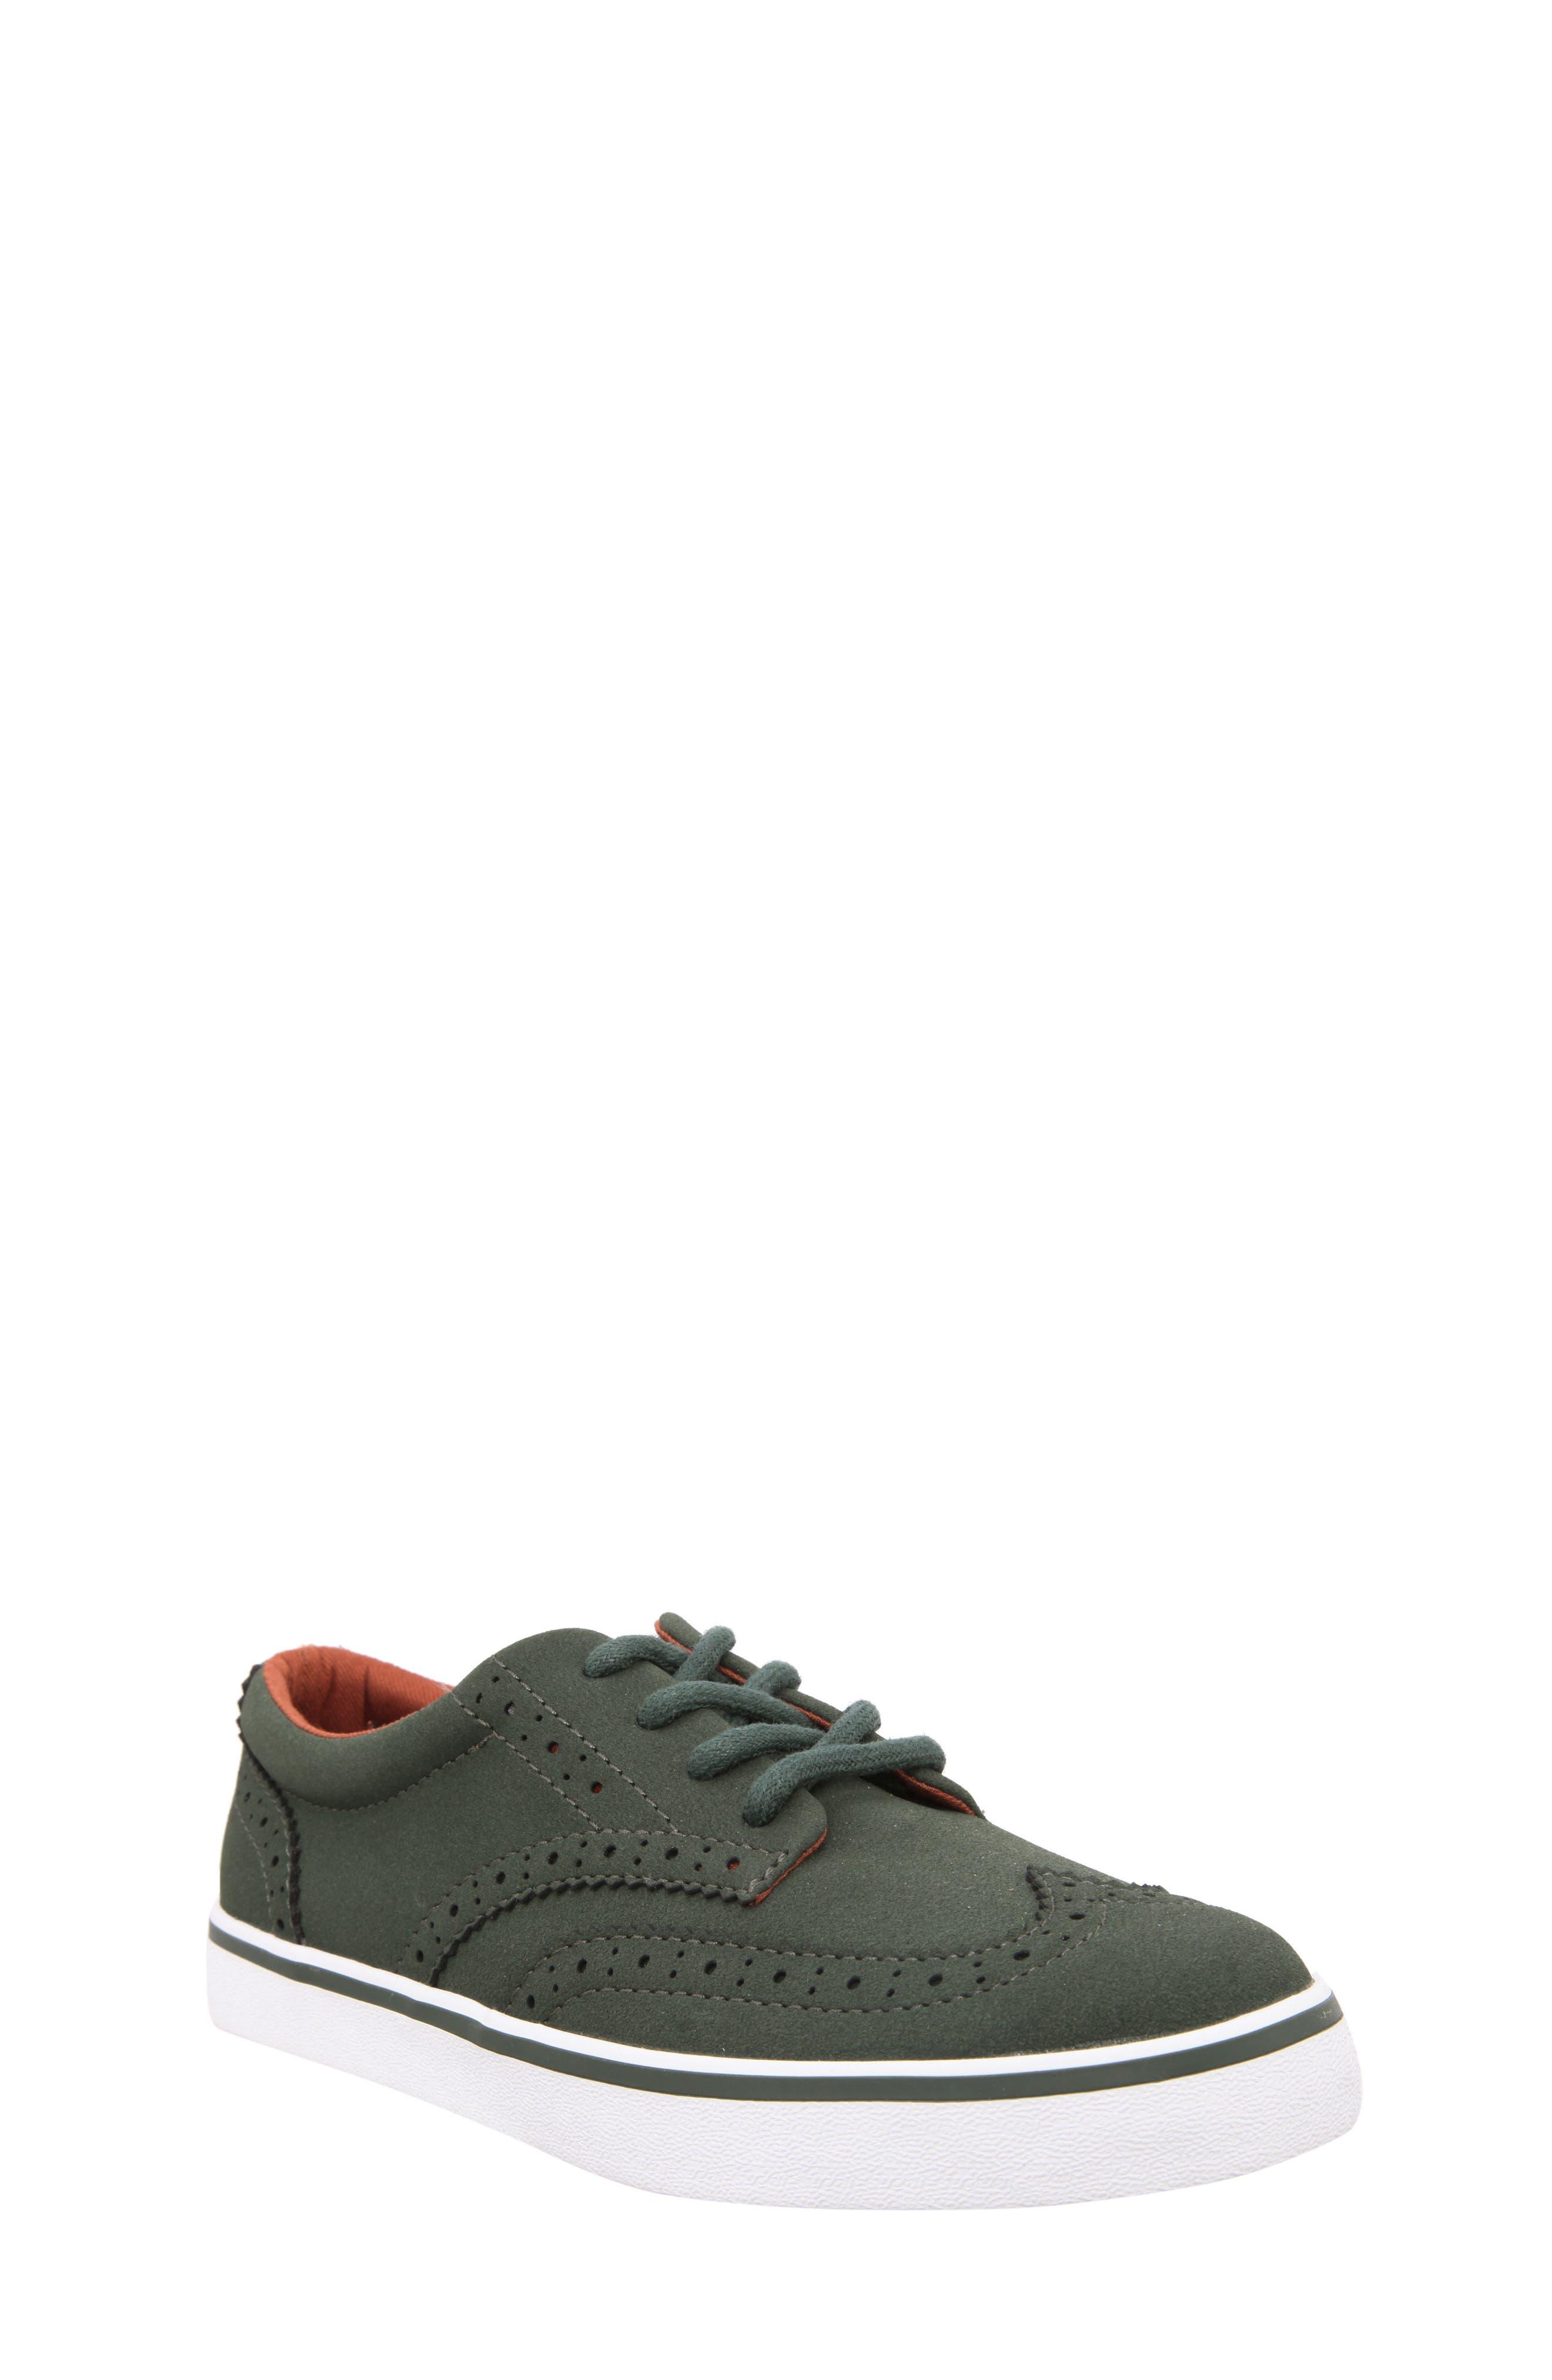 Wingtip Sneaker,                         Main,                         color, Olive Faux Suede